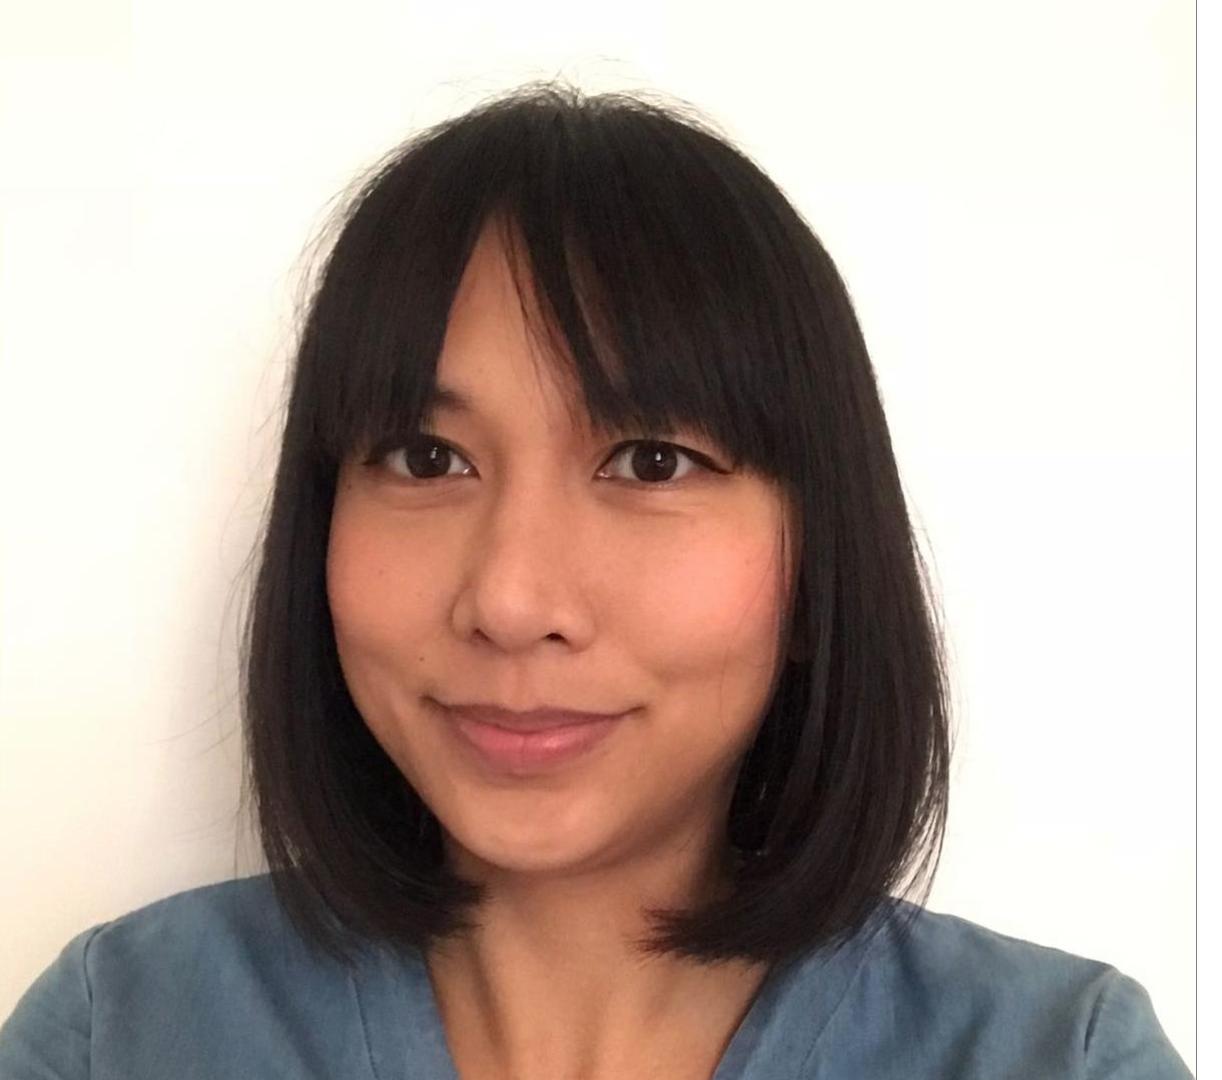 Behind the Scenes at Netflix UK: Part 1, An Nguyen